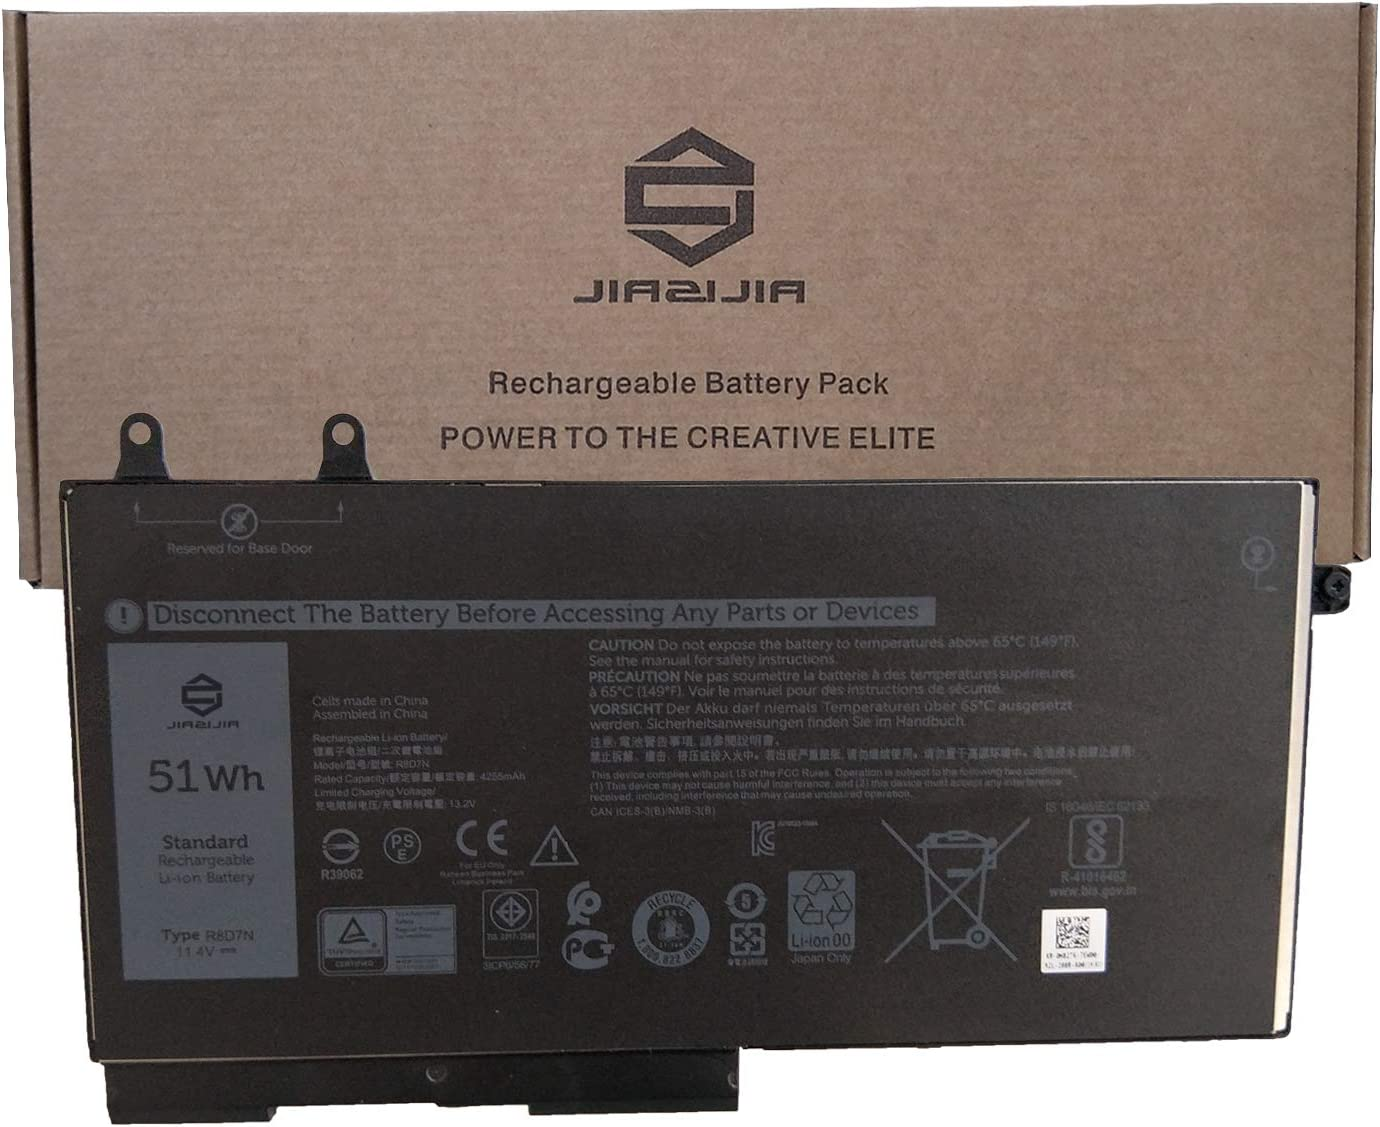 JIAZIJIA R8D7N Laptop Battery Replacement for Dell Latitude 5400 E5400 5410 E5410 5500 E5500 5510 E5510 Precision 3540 3550 Series Notebook 0H82T6 H82T6 0C5GV2 C5GV2 0W8GMW W8GMW 11.4V 51Wh 4255mAh